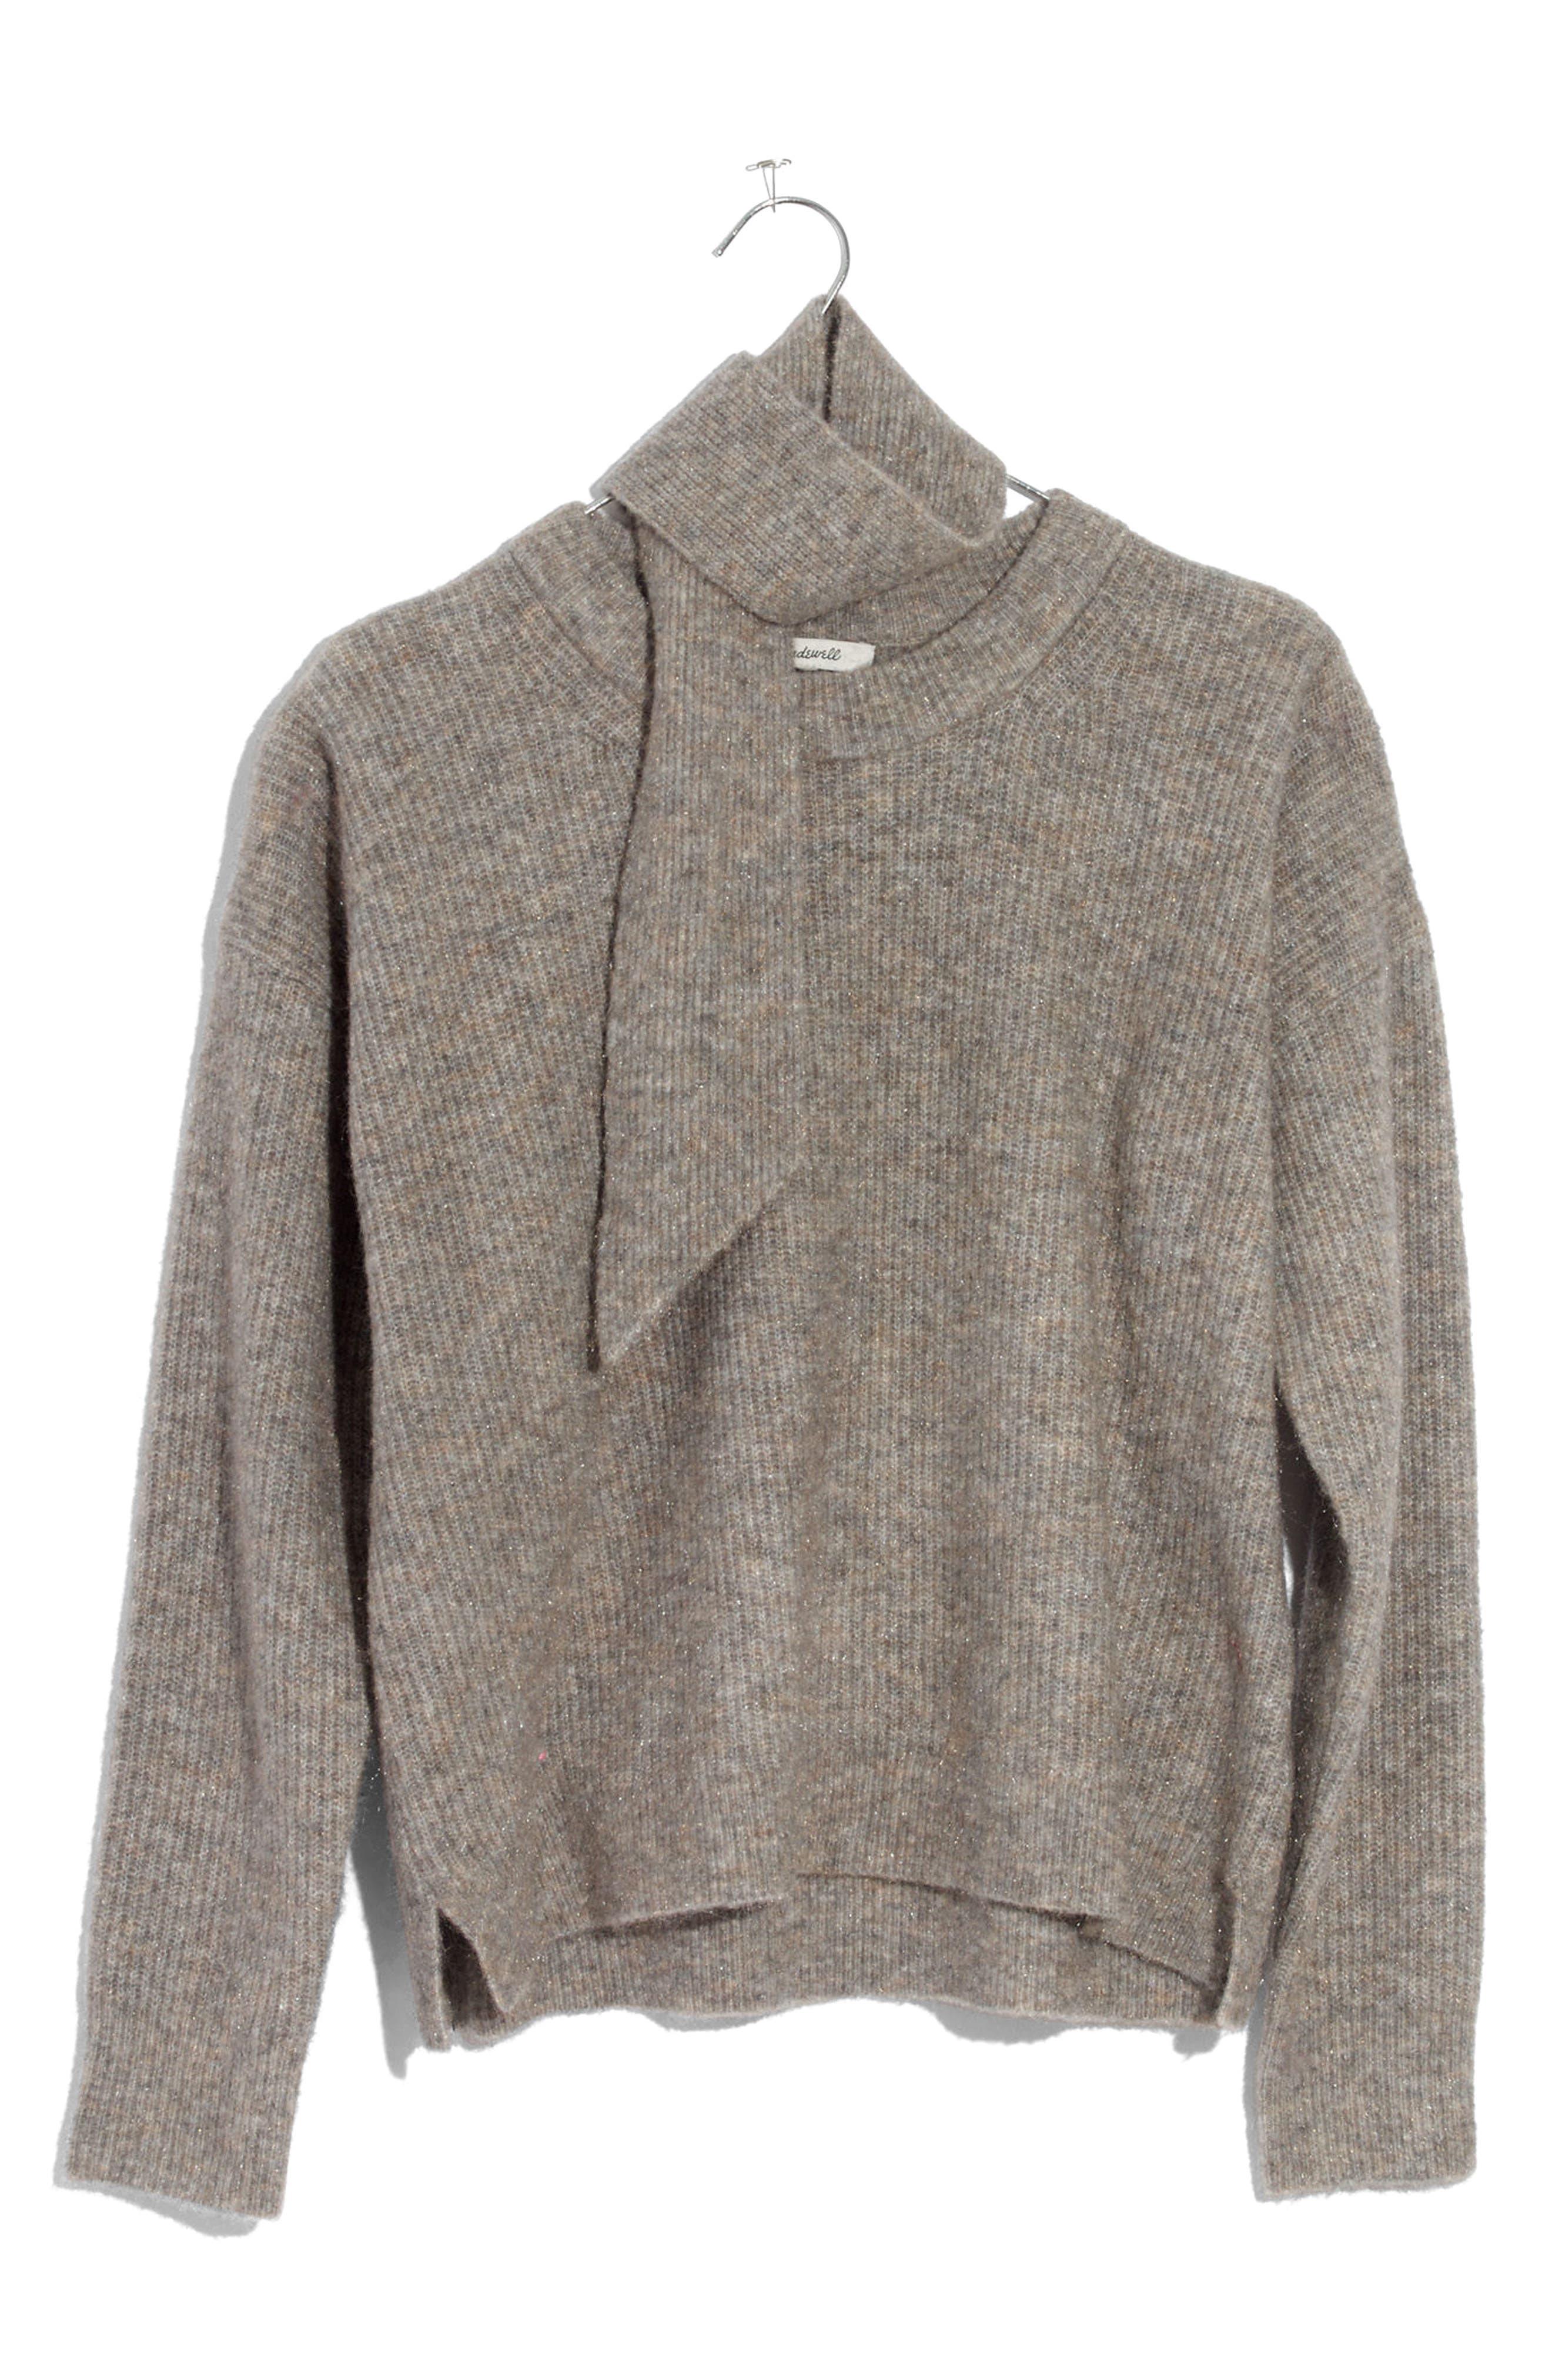 Sweater & Scarf Set,                             Alternate thumbnail 4, color,                             280